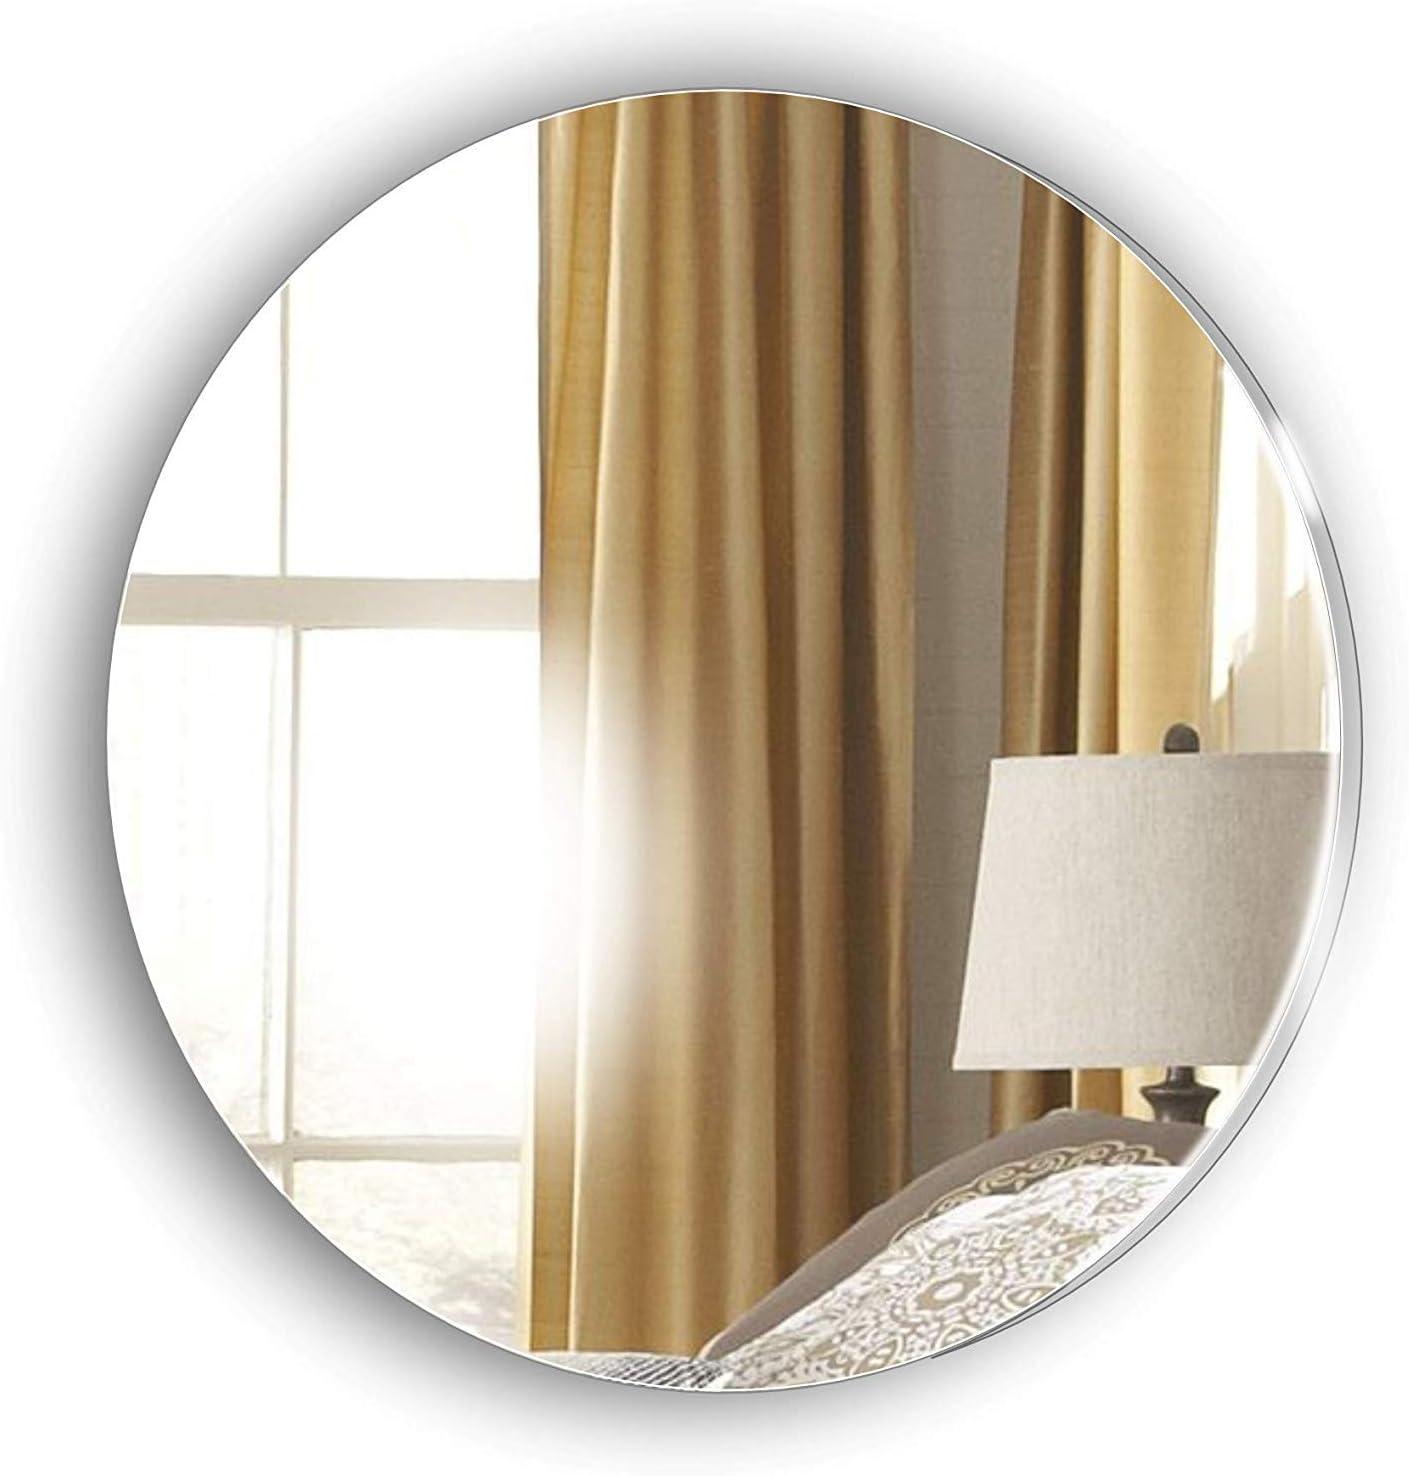 Decorative Circle Mirror Make Your Design Contemporary Creative Ideas Bedroom Living Room Hallway Any Room Amazon Co Uk Kitchen Home